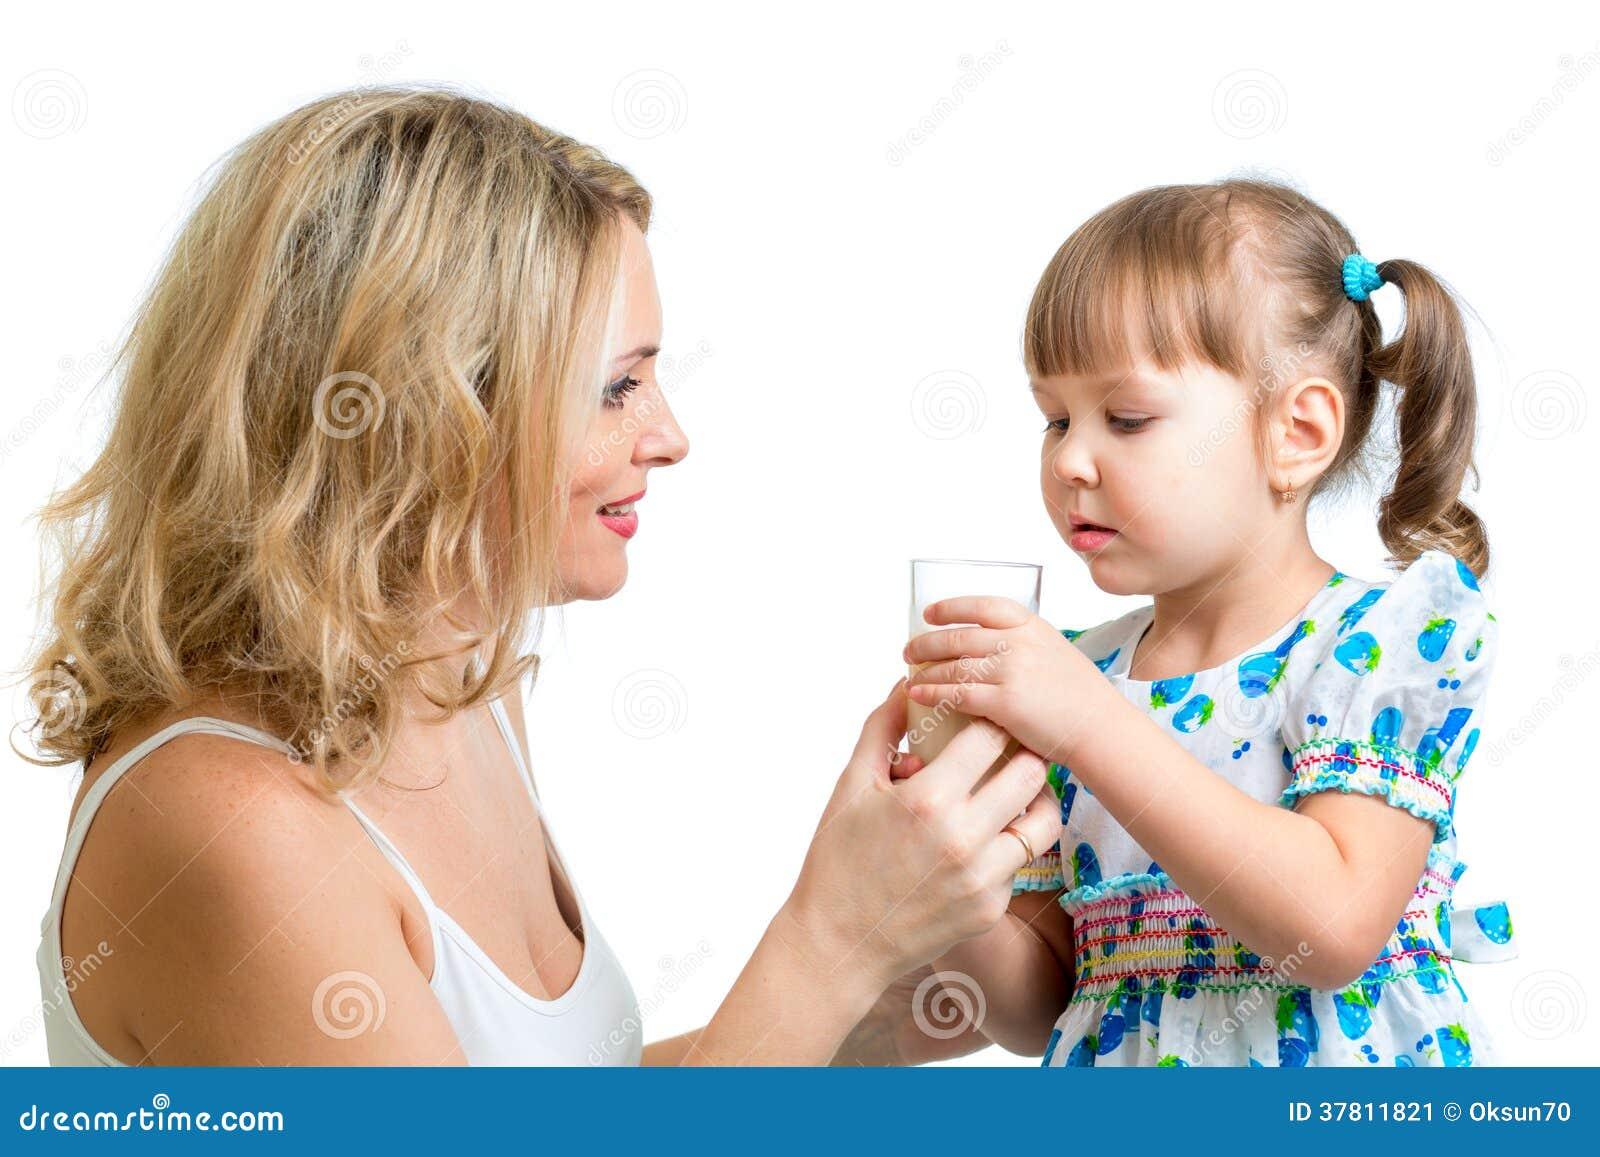 Milk and mom, Favorites list - XVIDEOSCOM